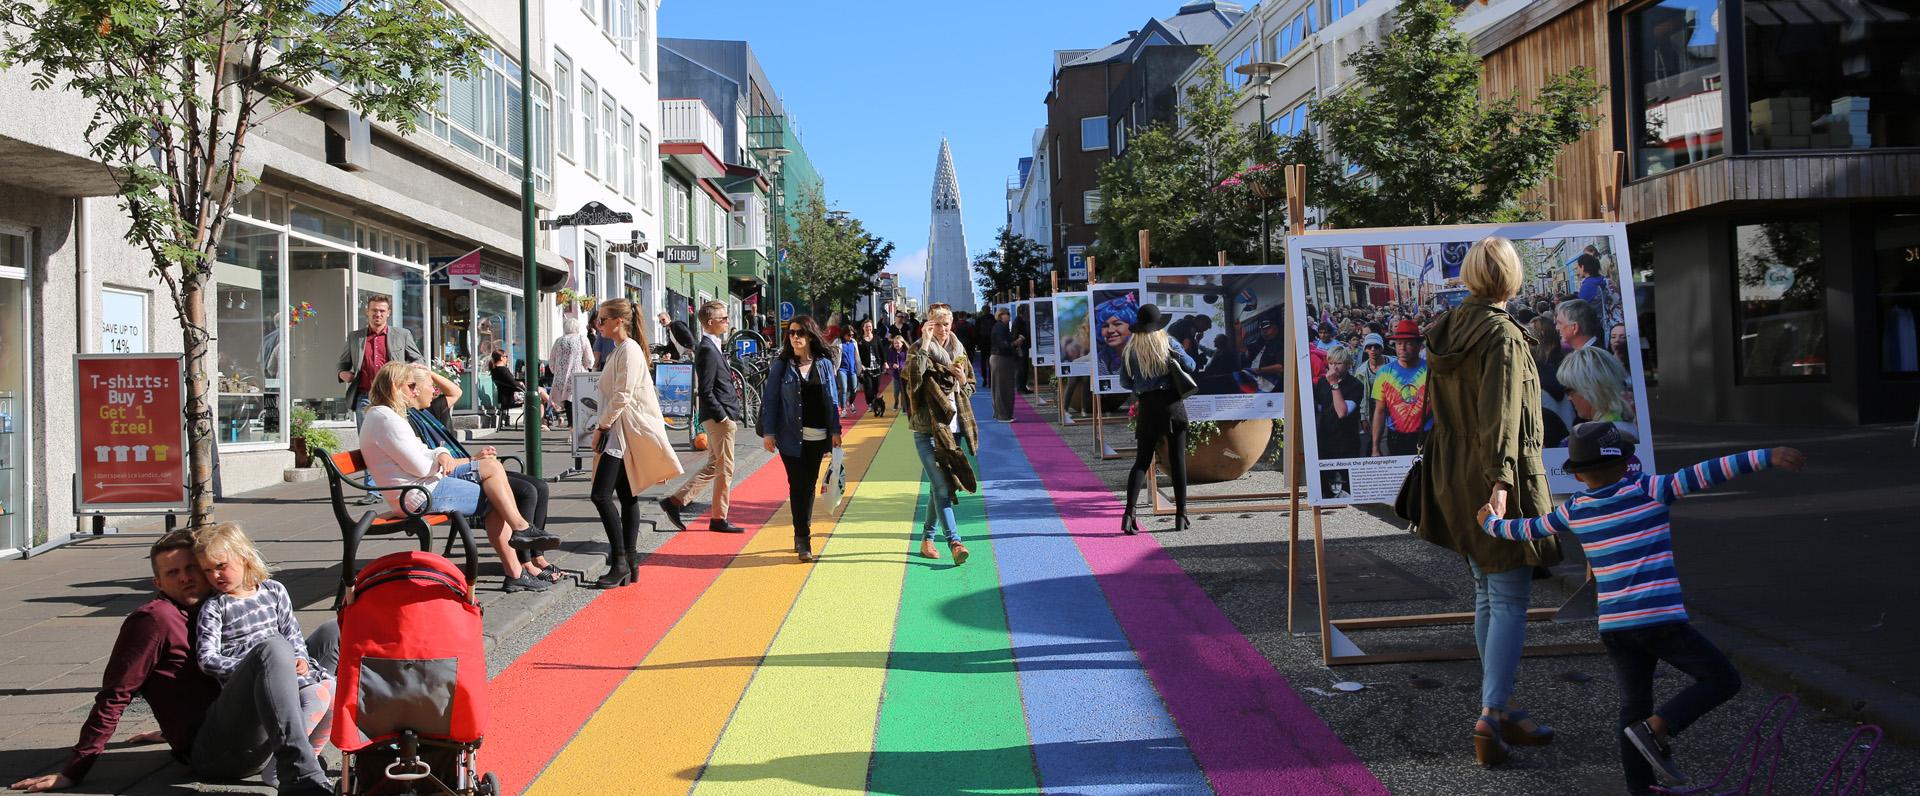 Reykjavik, the colored street of Skolavordustigur